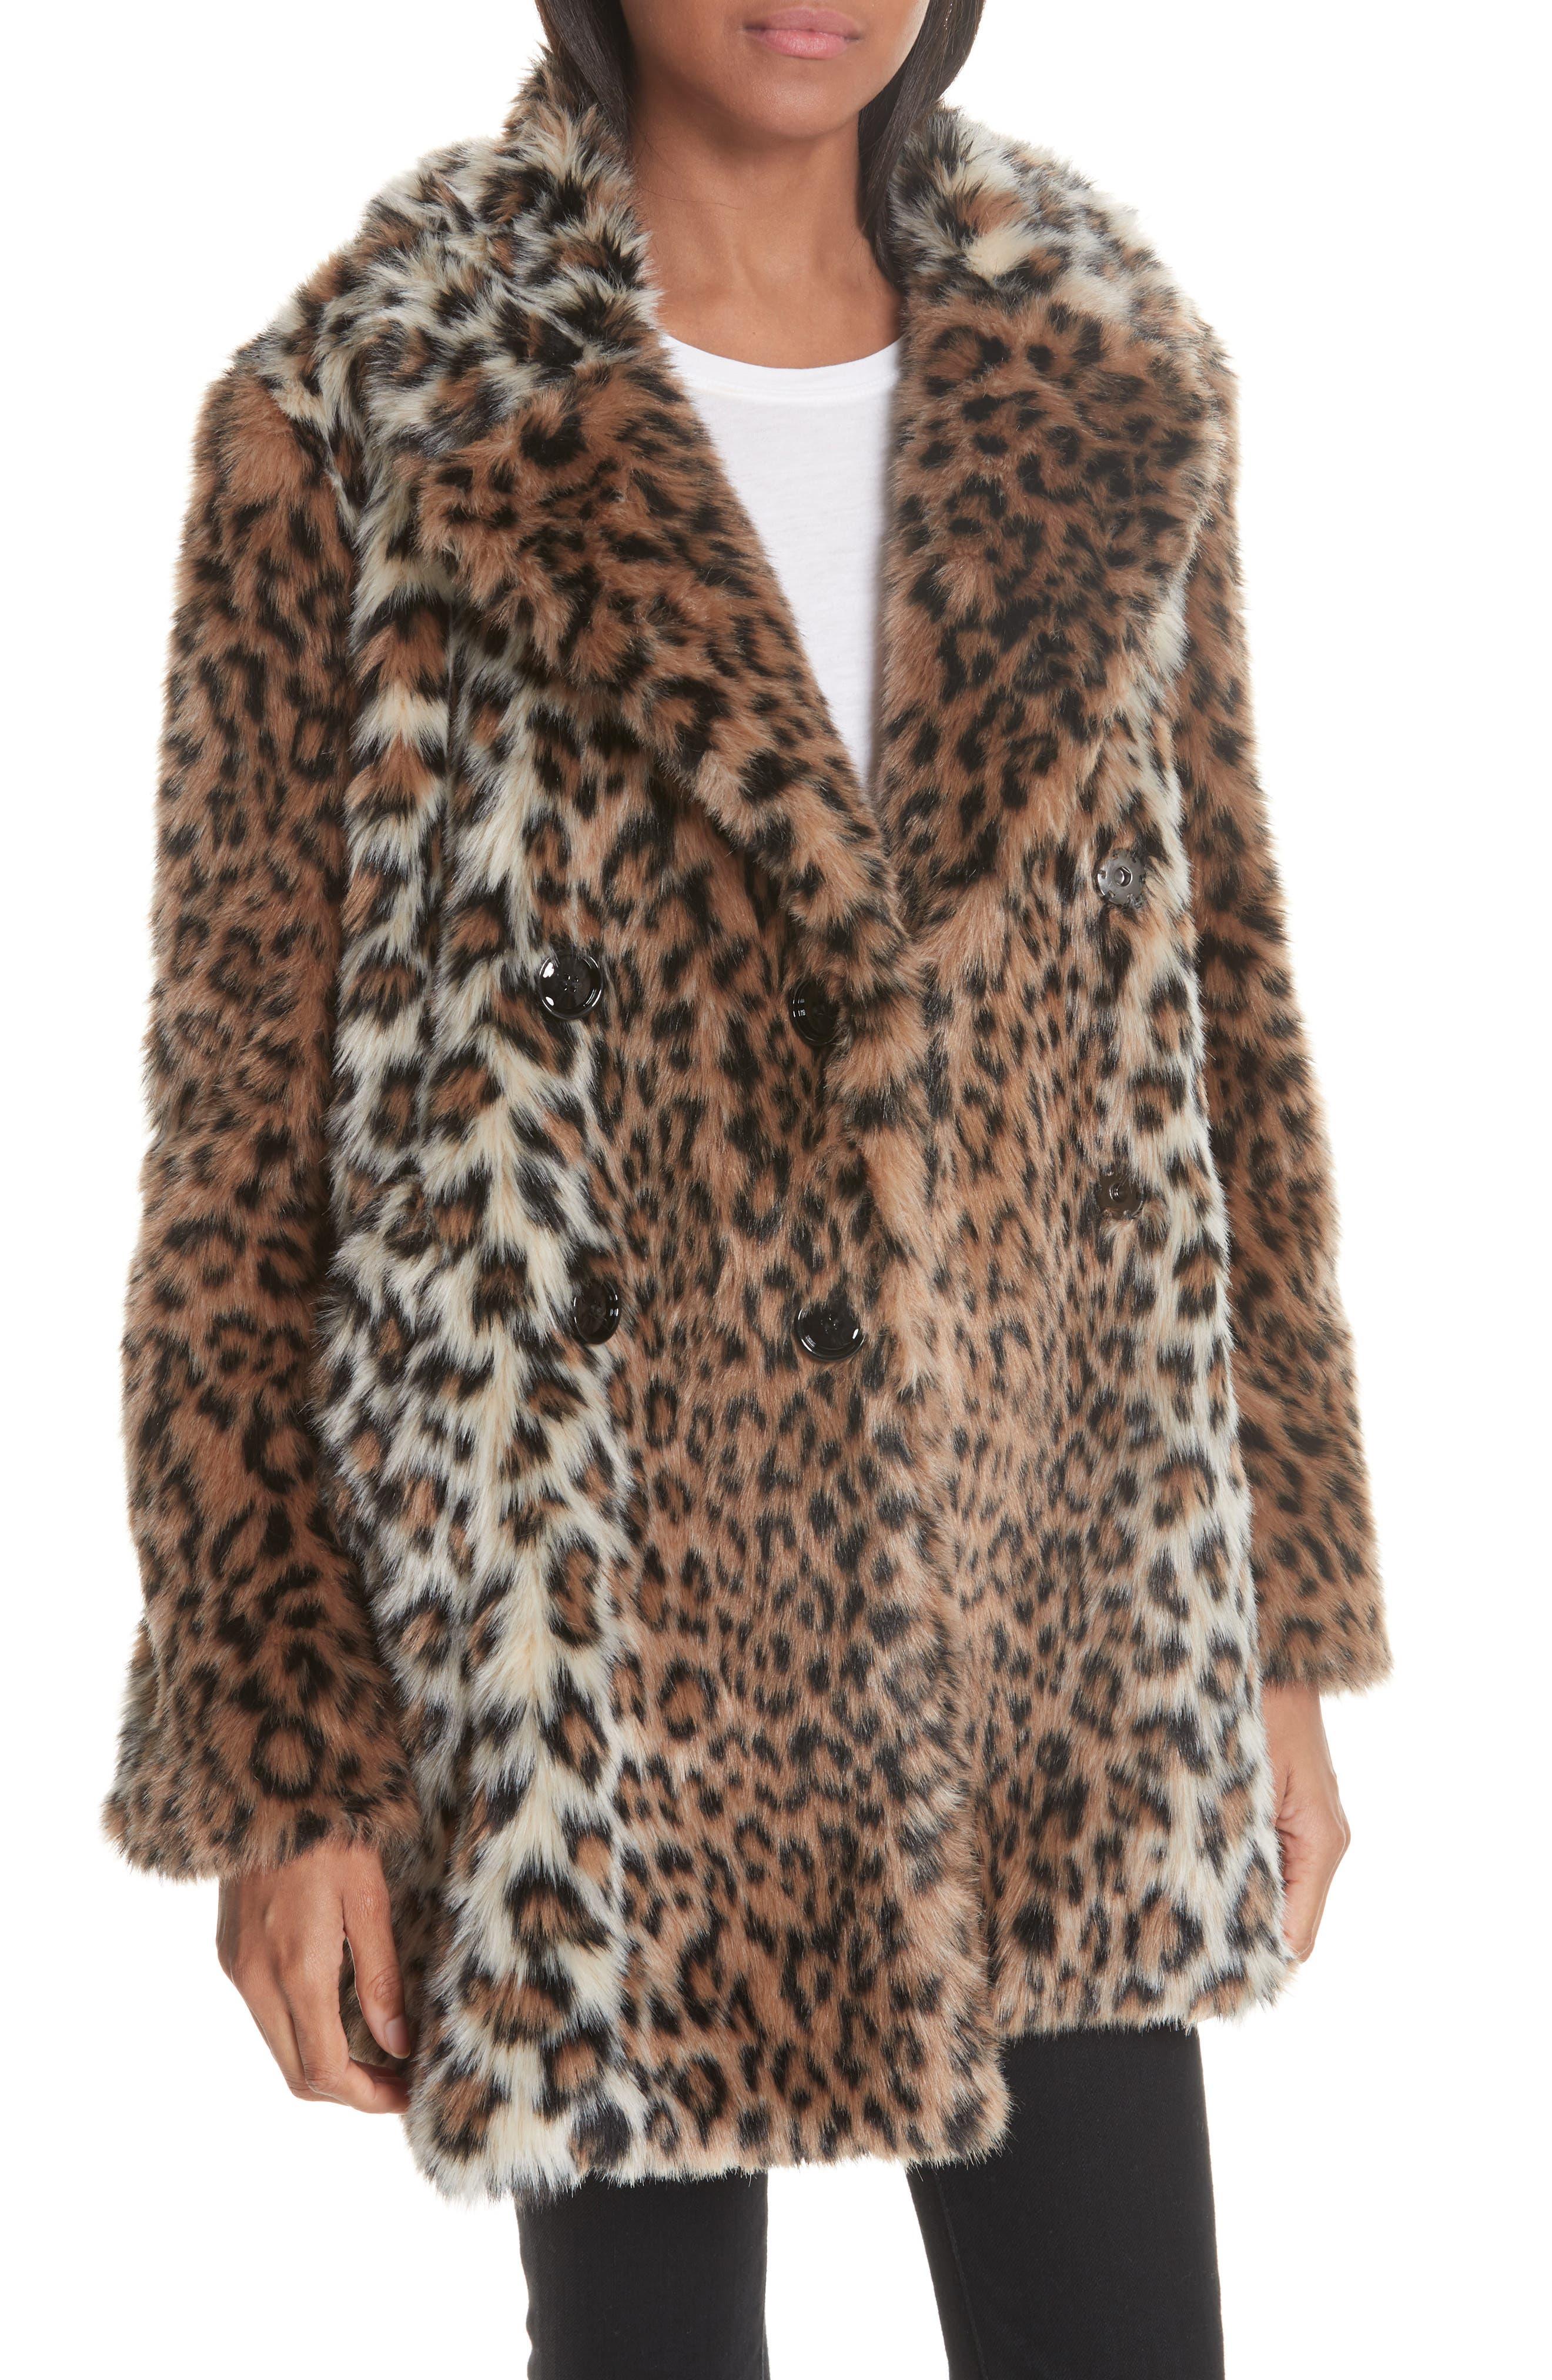 Tiaret Faux Fur Jacket by Joie